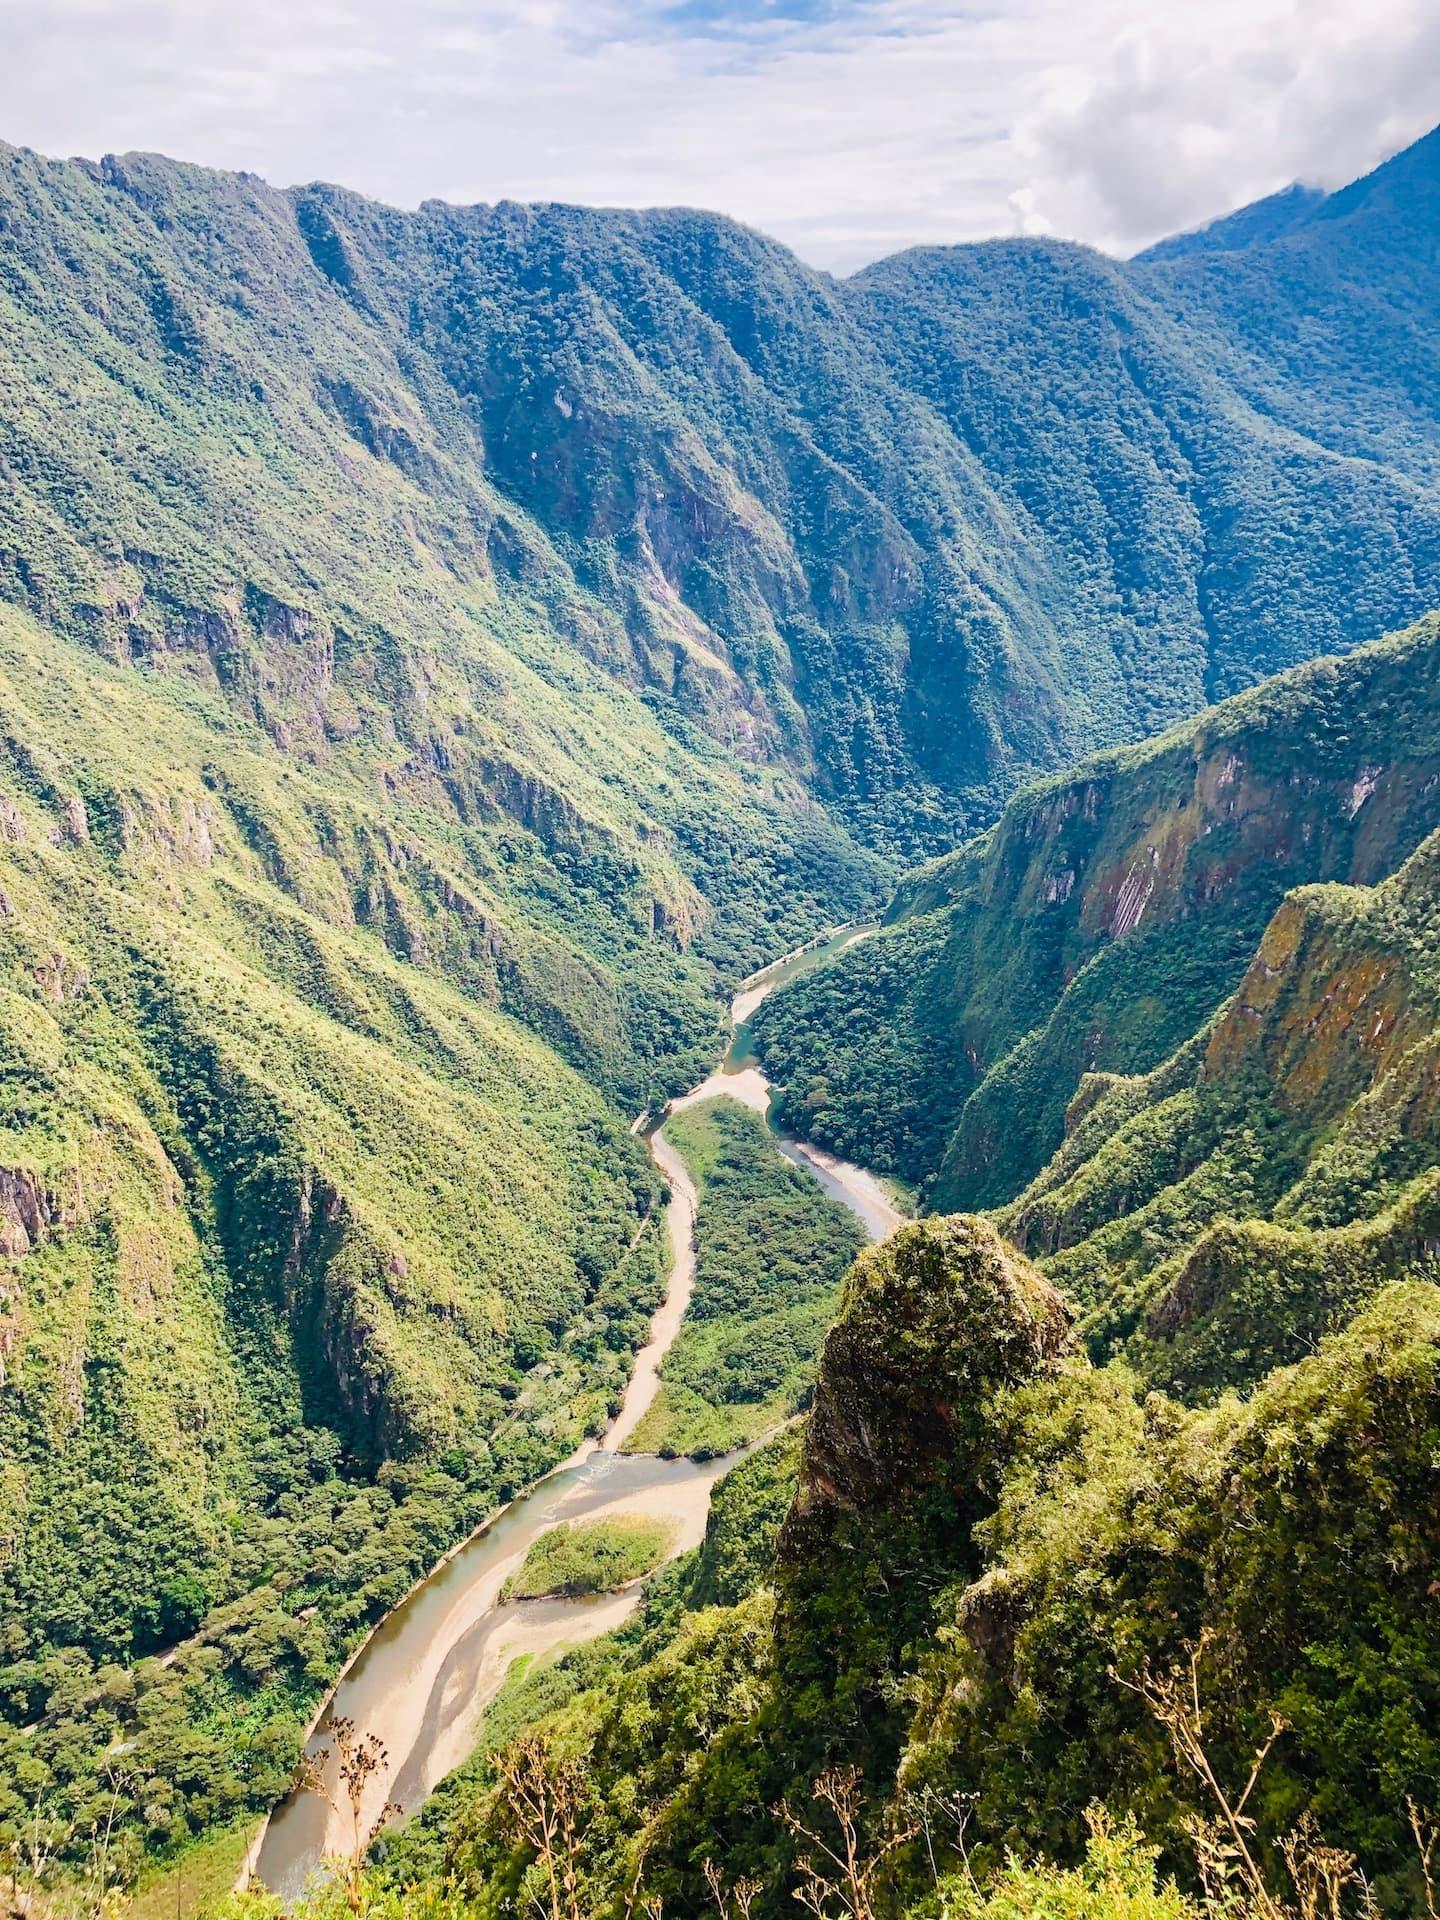 The First Principle Machu Picchu Post Expedition 11.jpg